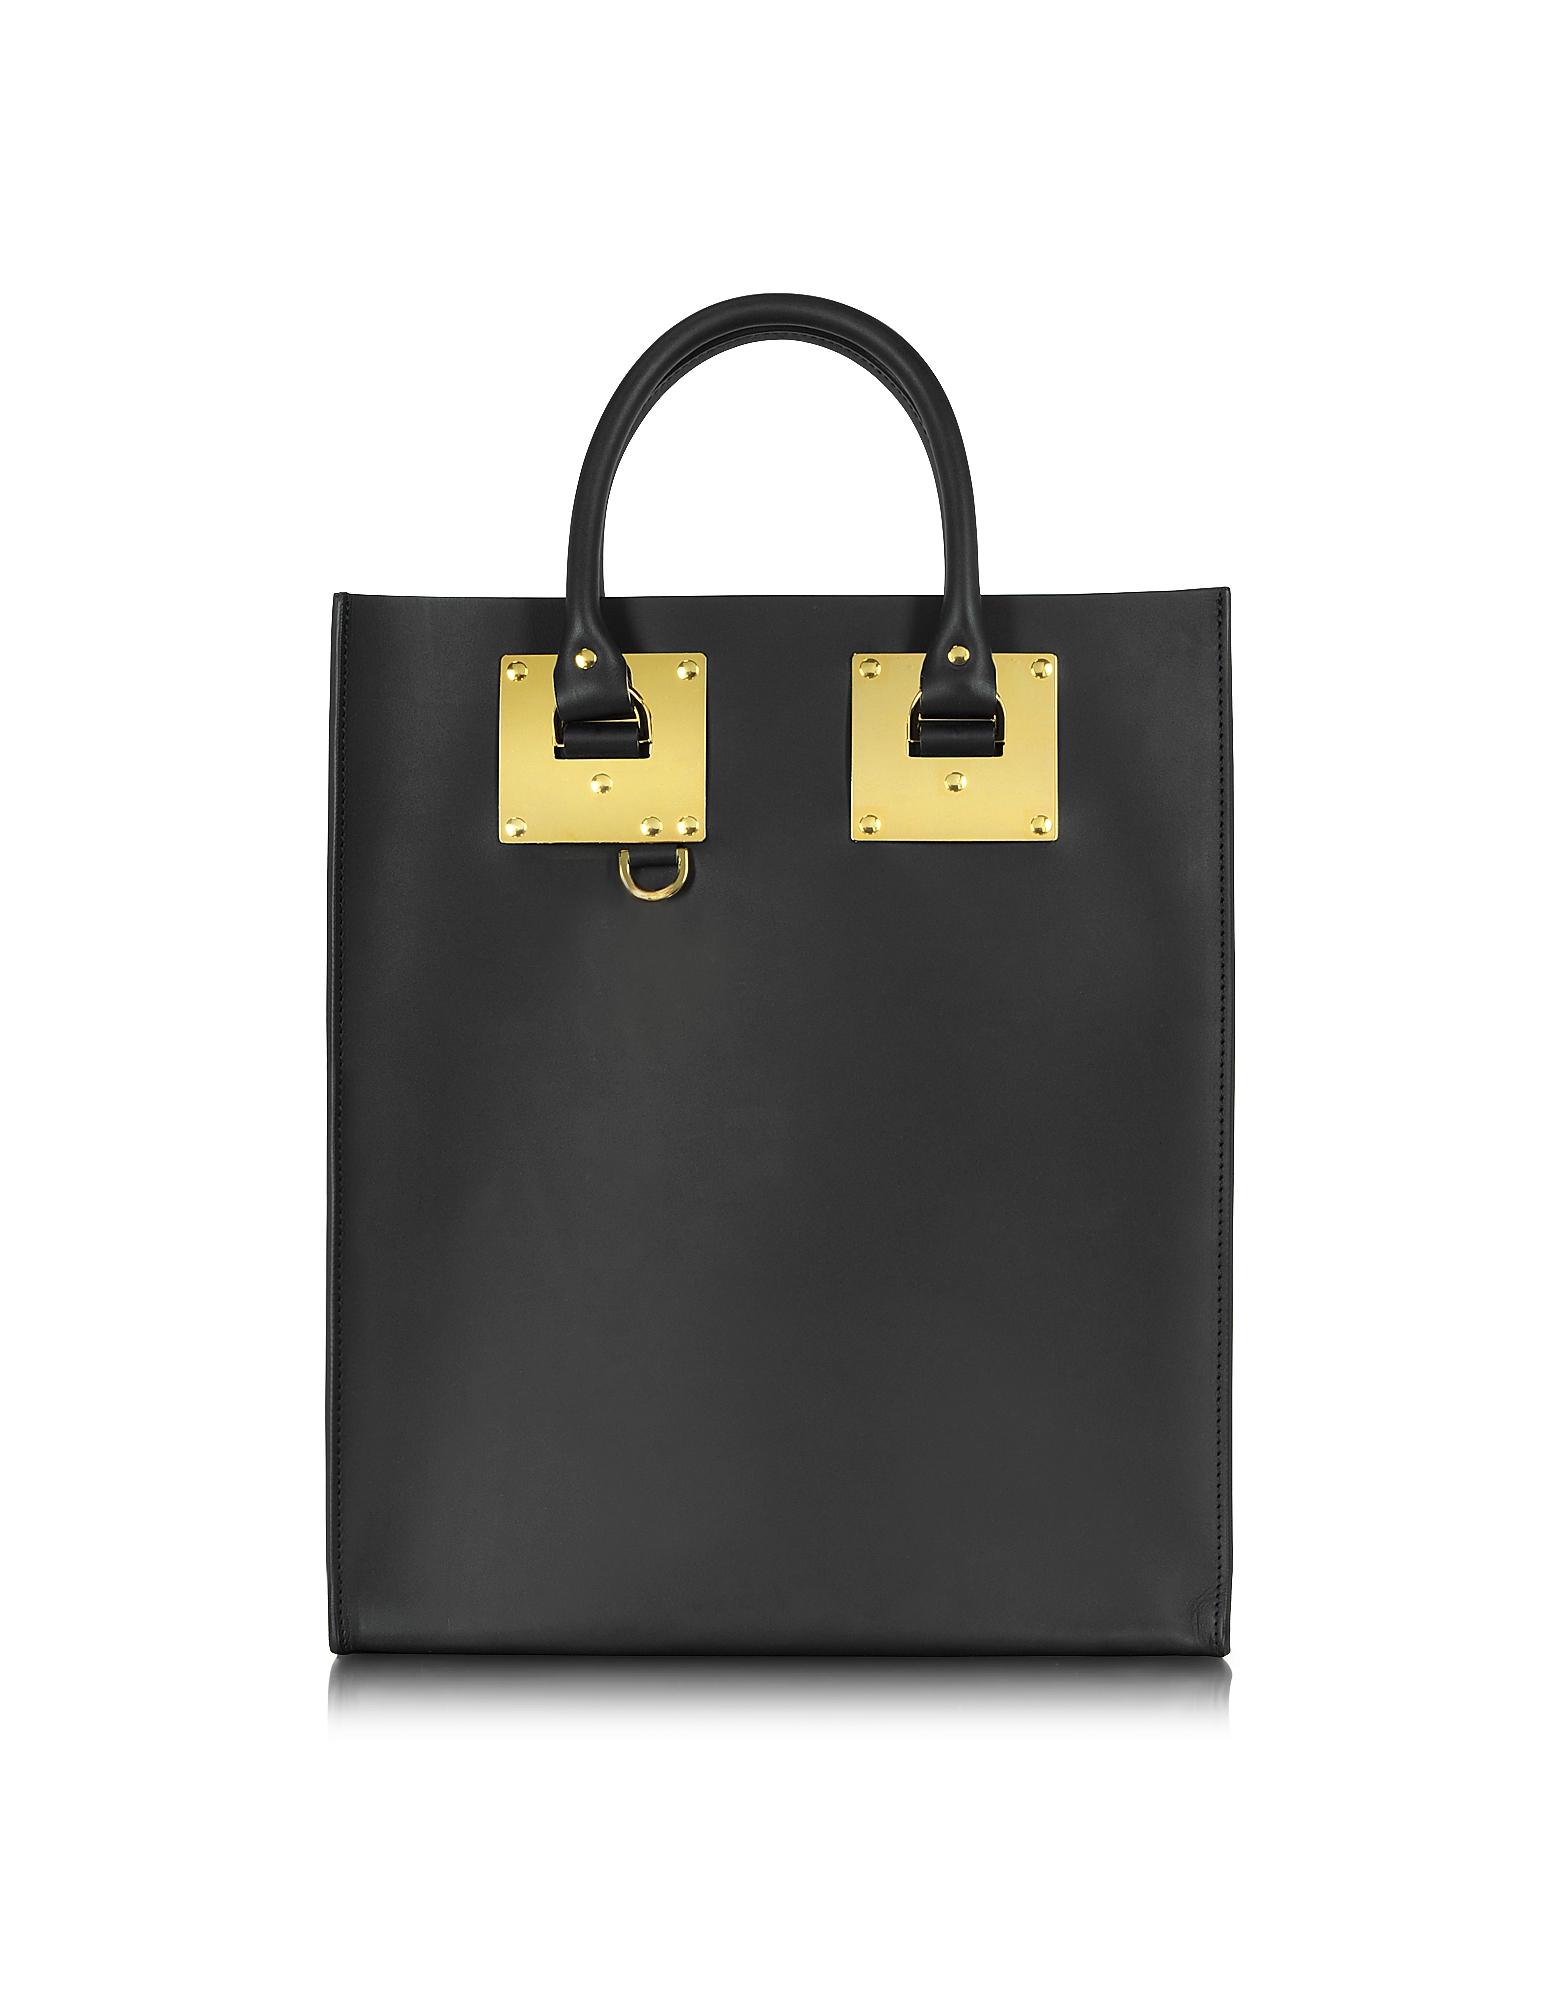 Sophie Hulme Handbags, Black Albion Mini Tote Bag w/Zip Pocket